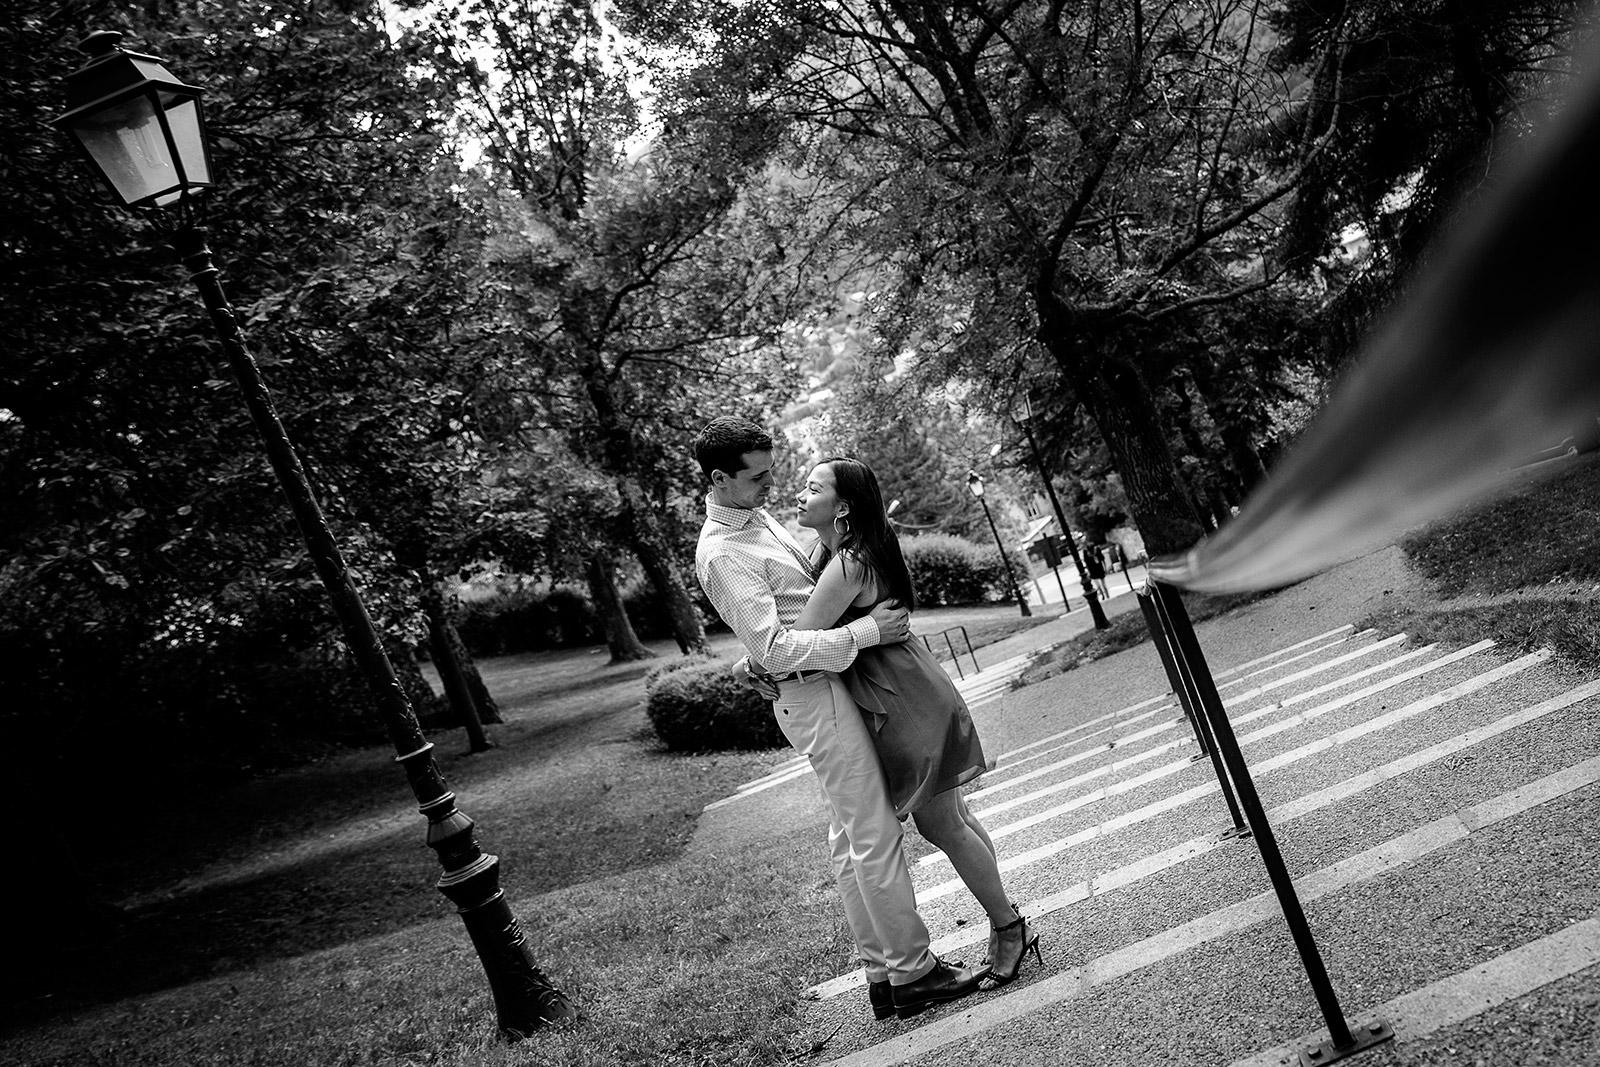 meilleurs avis photographe de mariage Serre Chevalier Briancon Castille ALMA Photographe de mariage Serre Chevalier Briançon